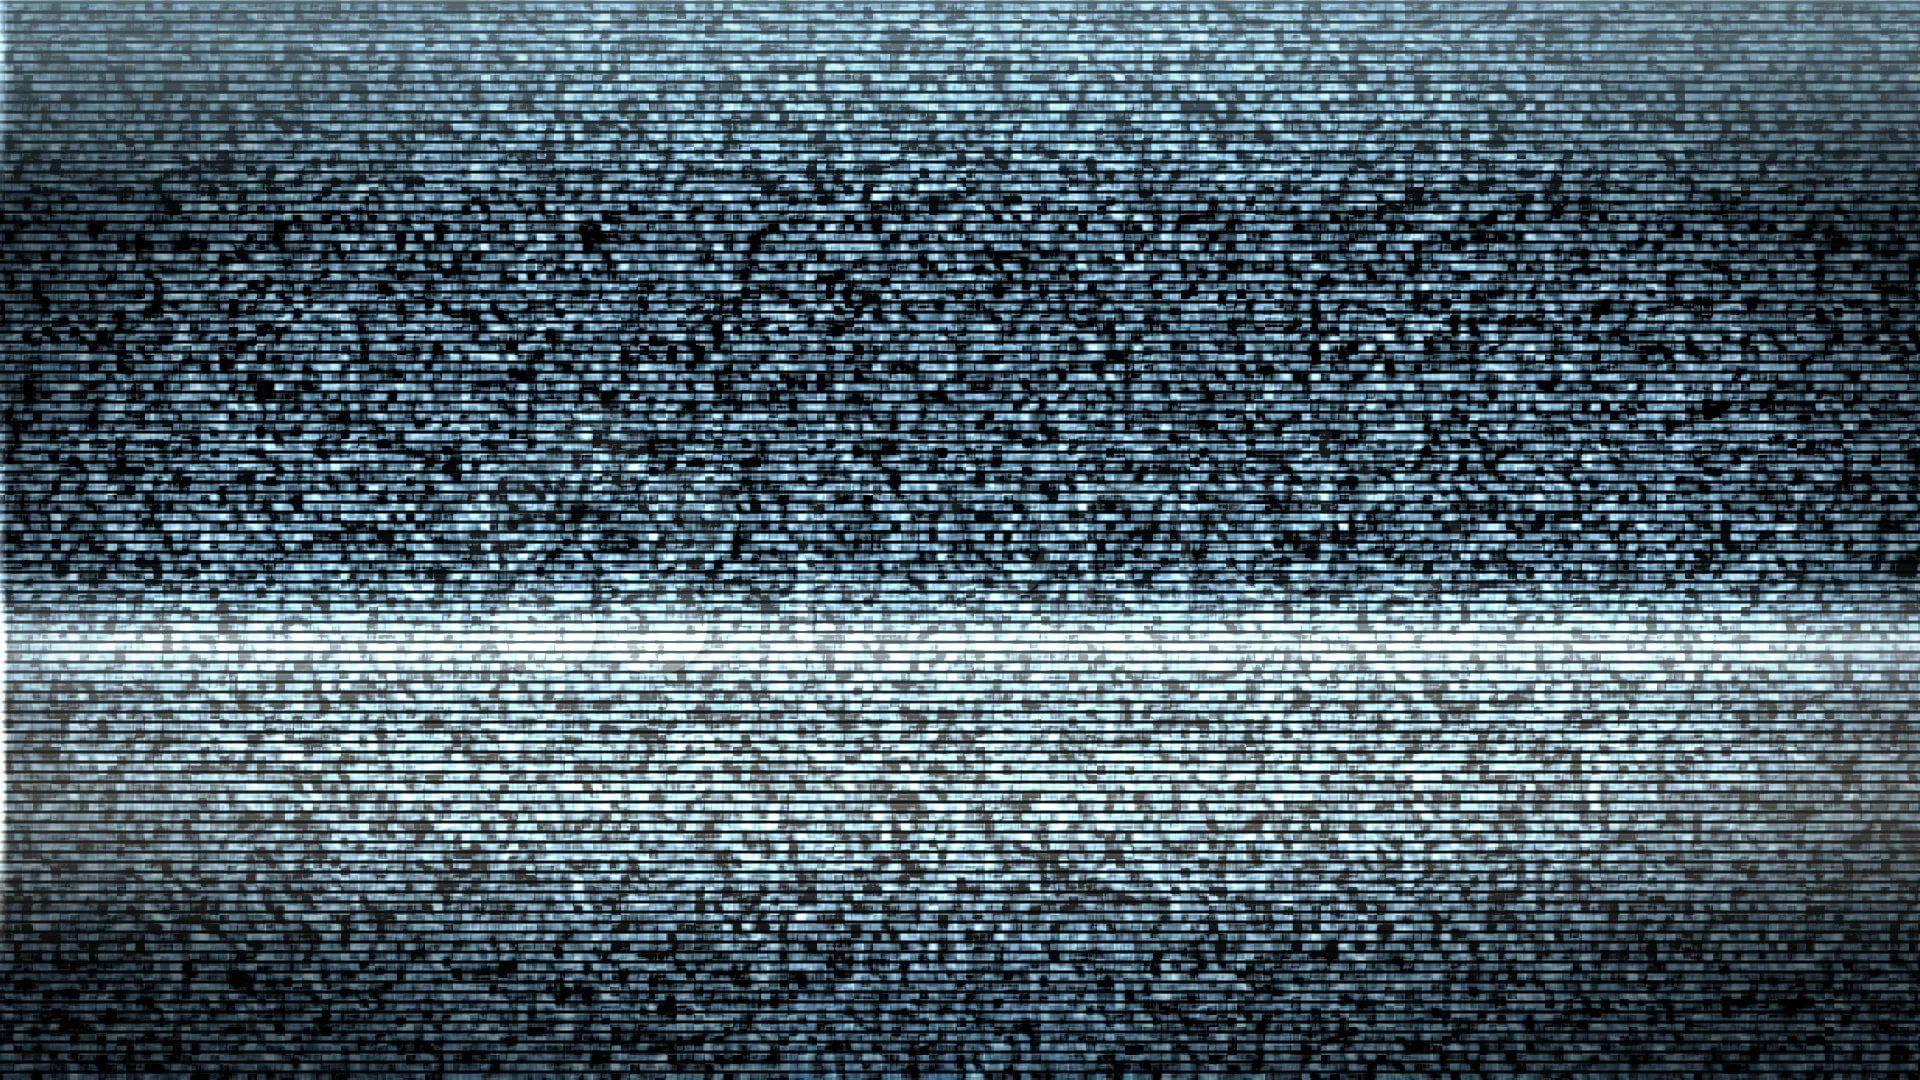 Tv Static hd wallpaper